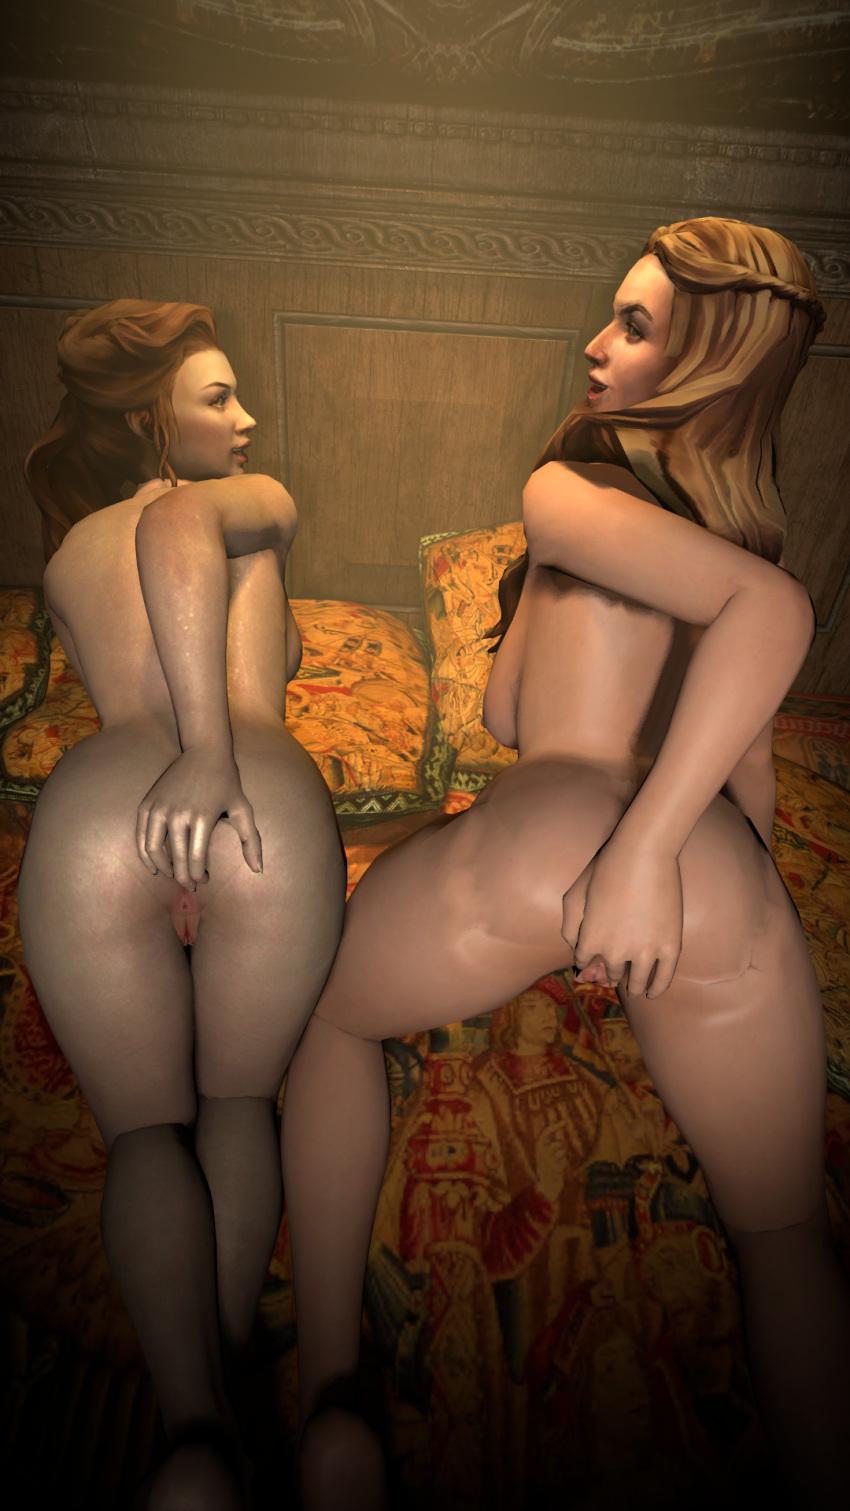 thrones fake of game nudes Slenderman x jeff the killer